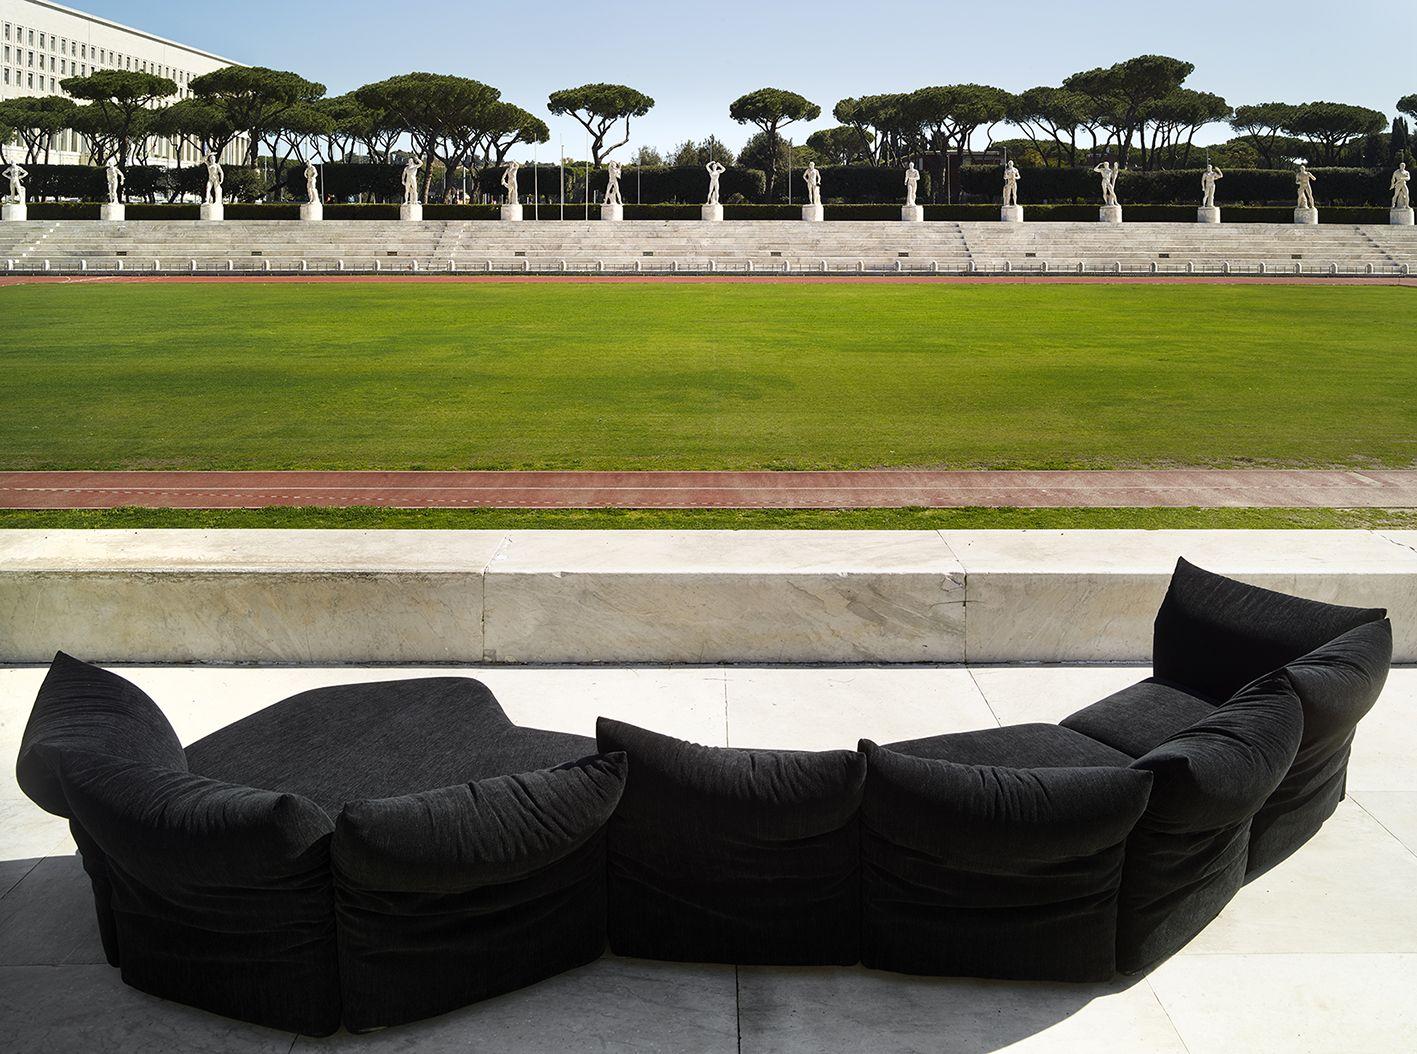 Stadio dei Marmi - Roma - image 7